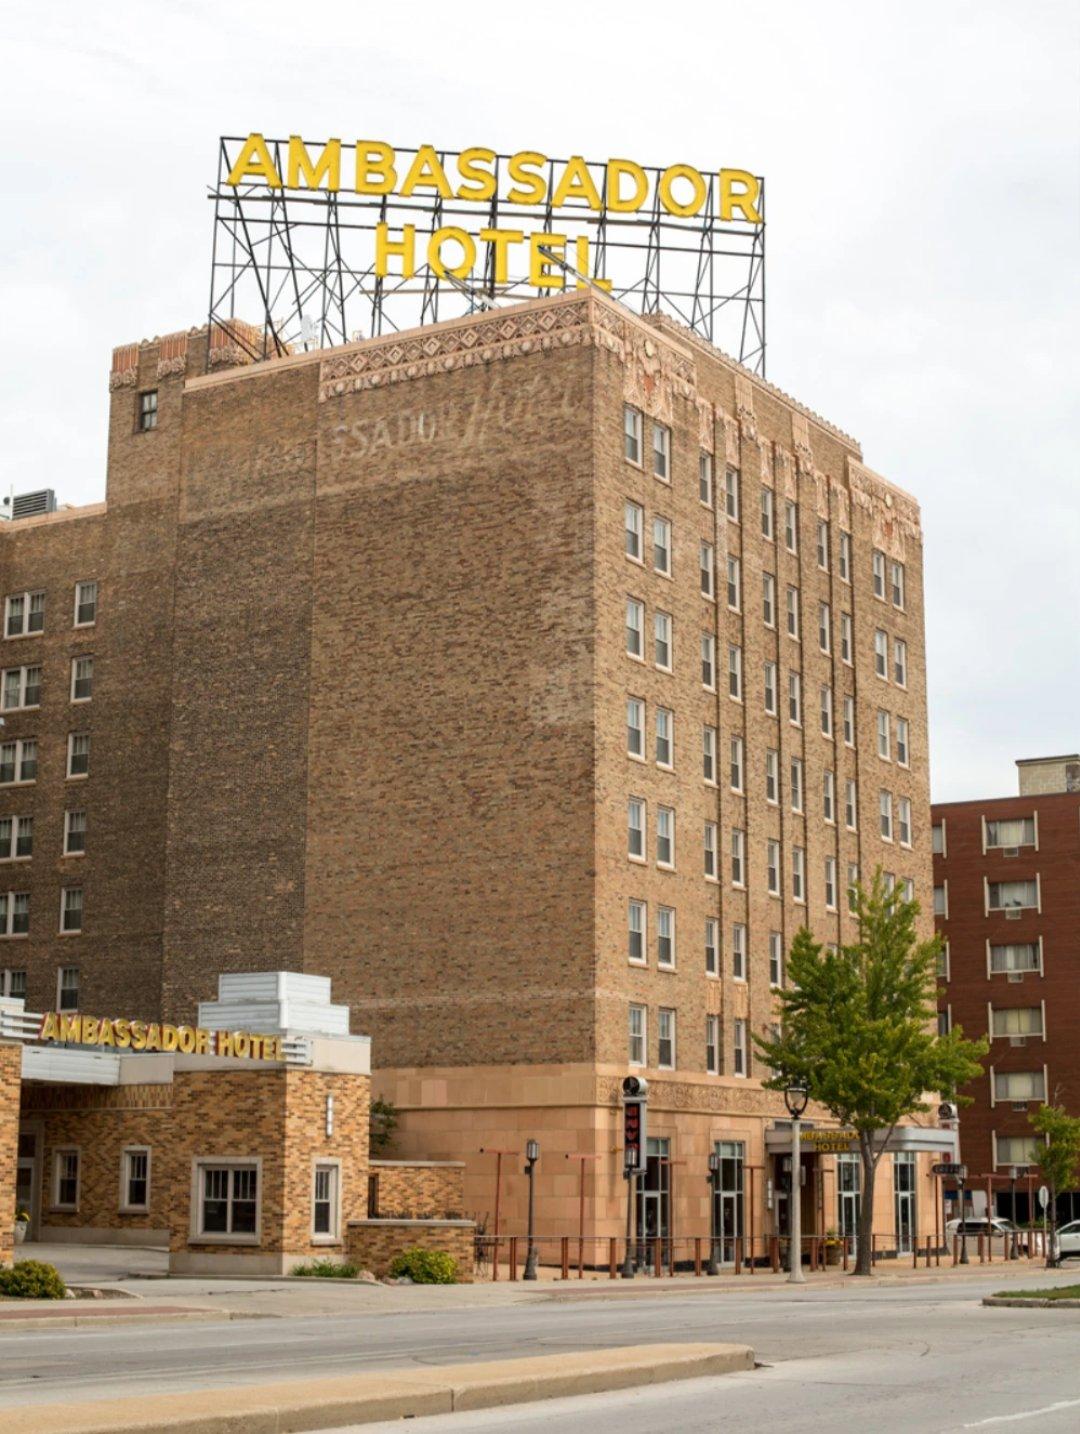 Ambassador Hotel | Milwaukee, Wisconsin